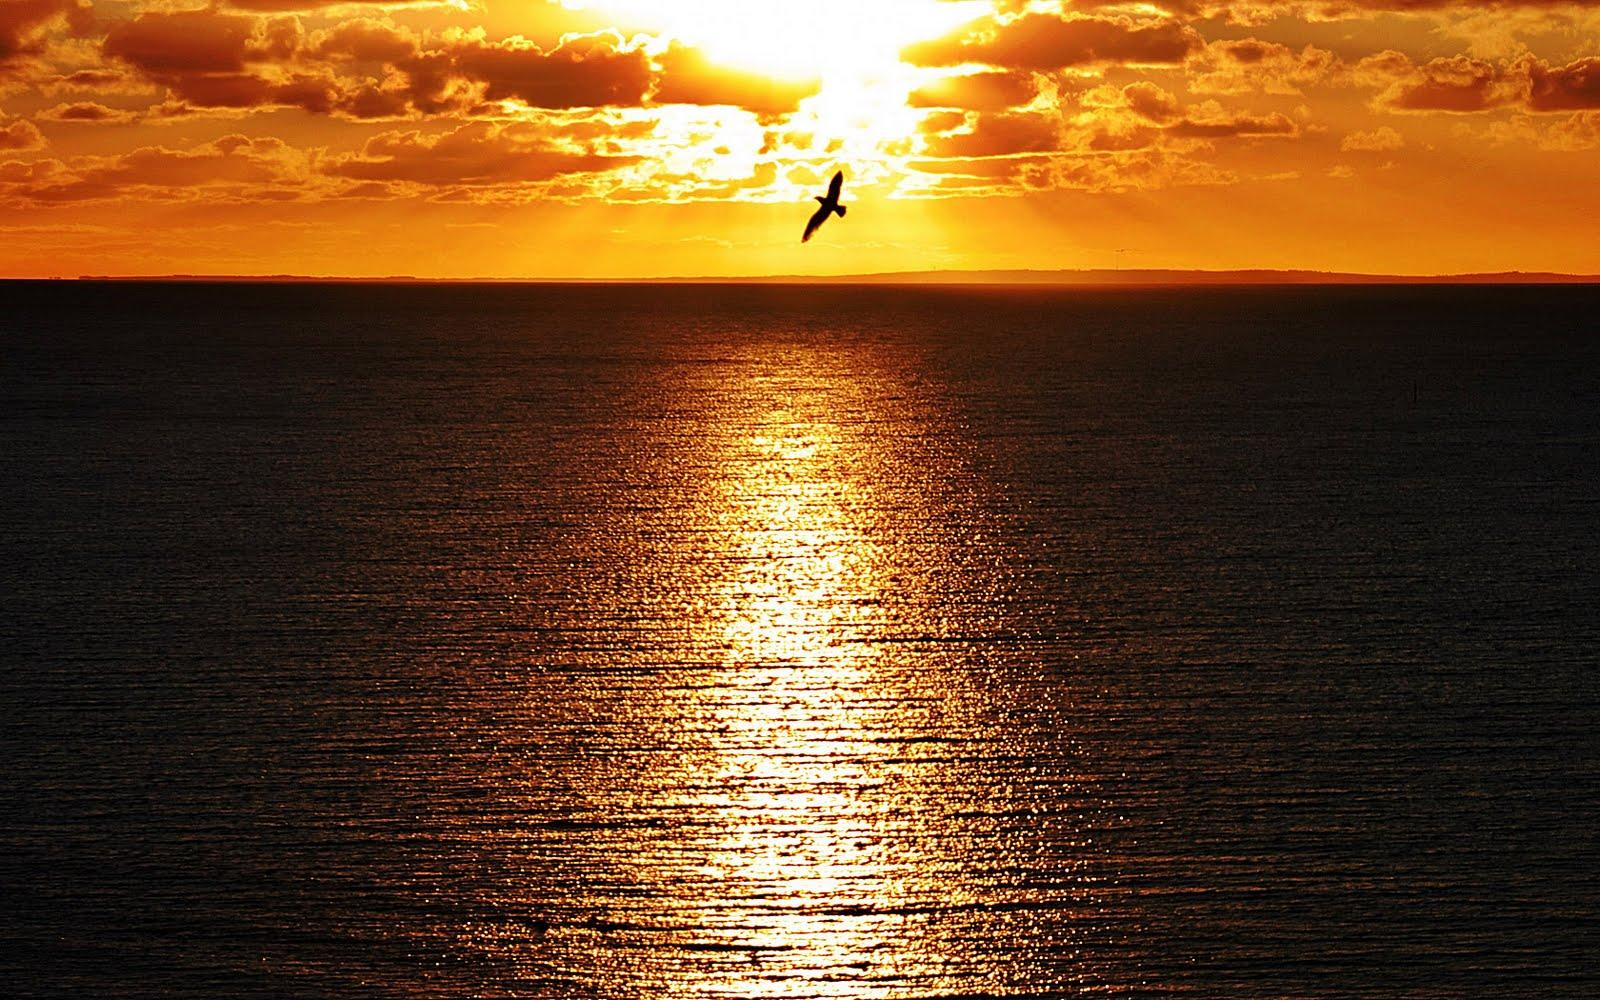 http://2.bp.blogspot.com/-tpnGRt7yd-I/Tk4yb_hZPpI/AAAAAAAAAMg/gBhMOG-rV1c/s1600/sunset_wallpaper_15.jpg